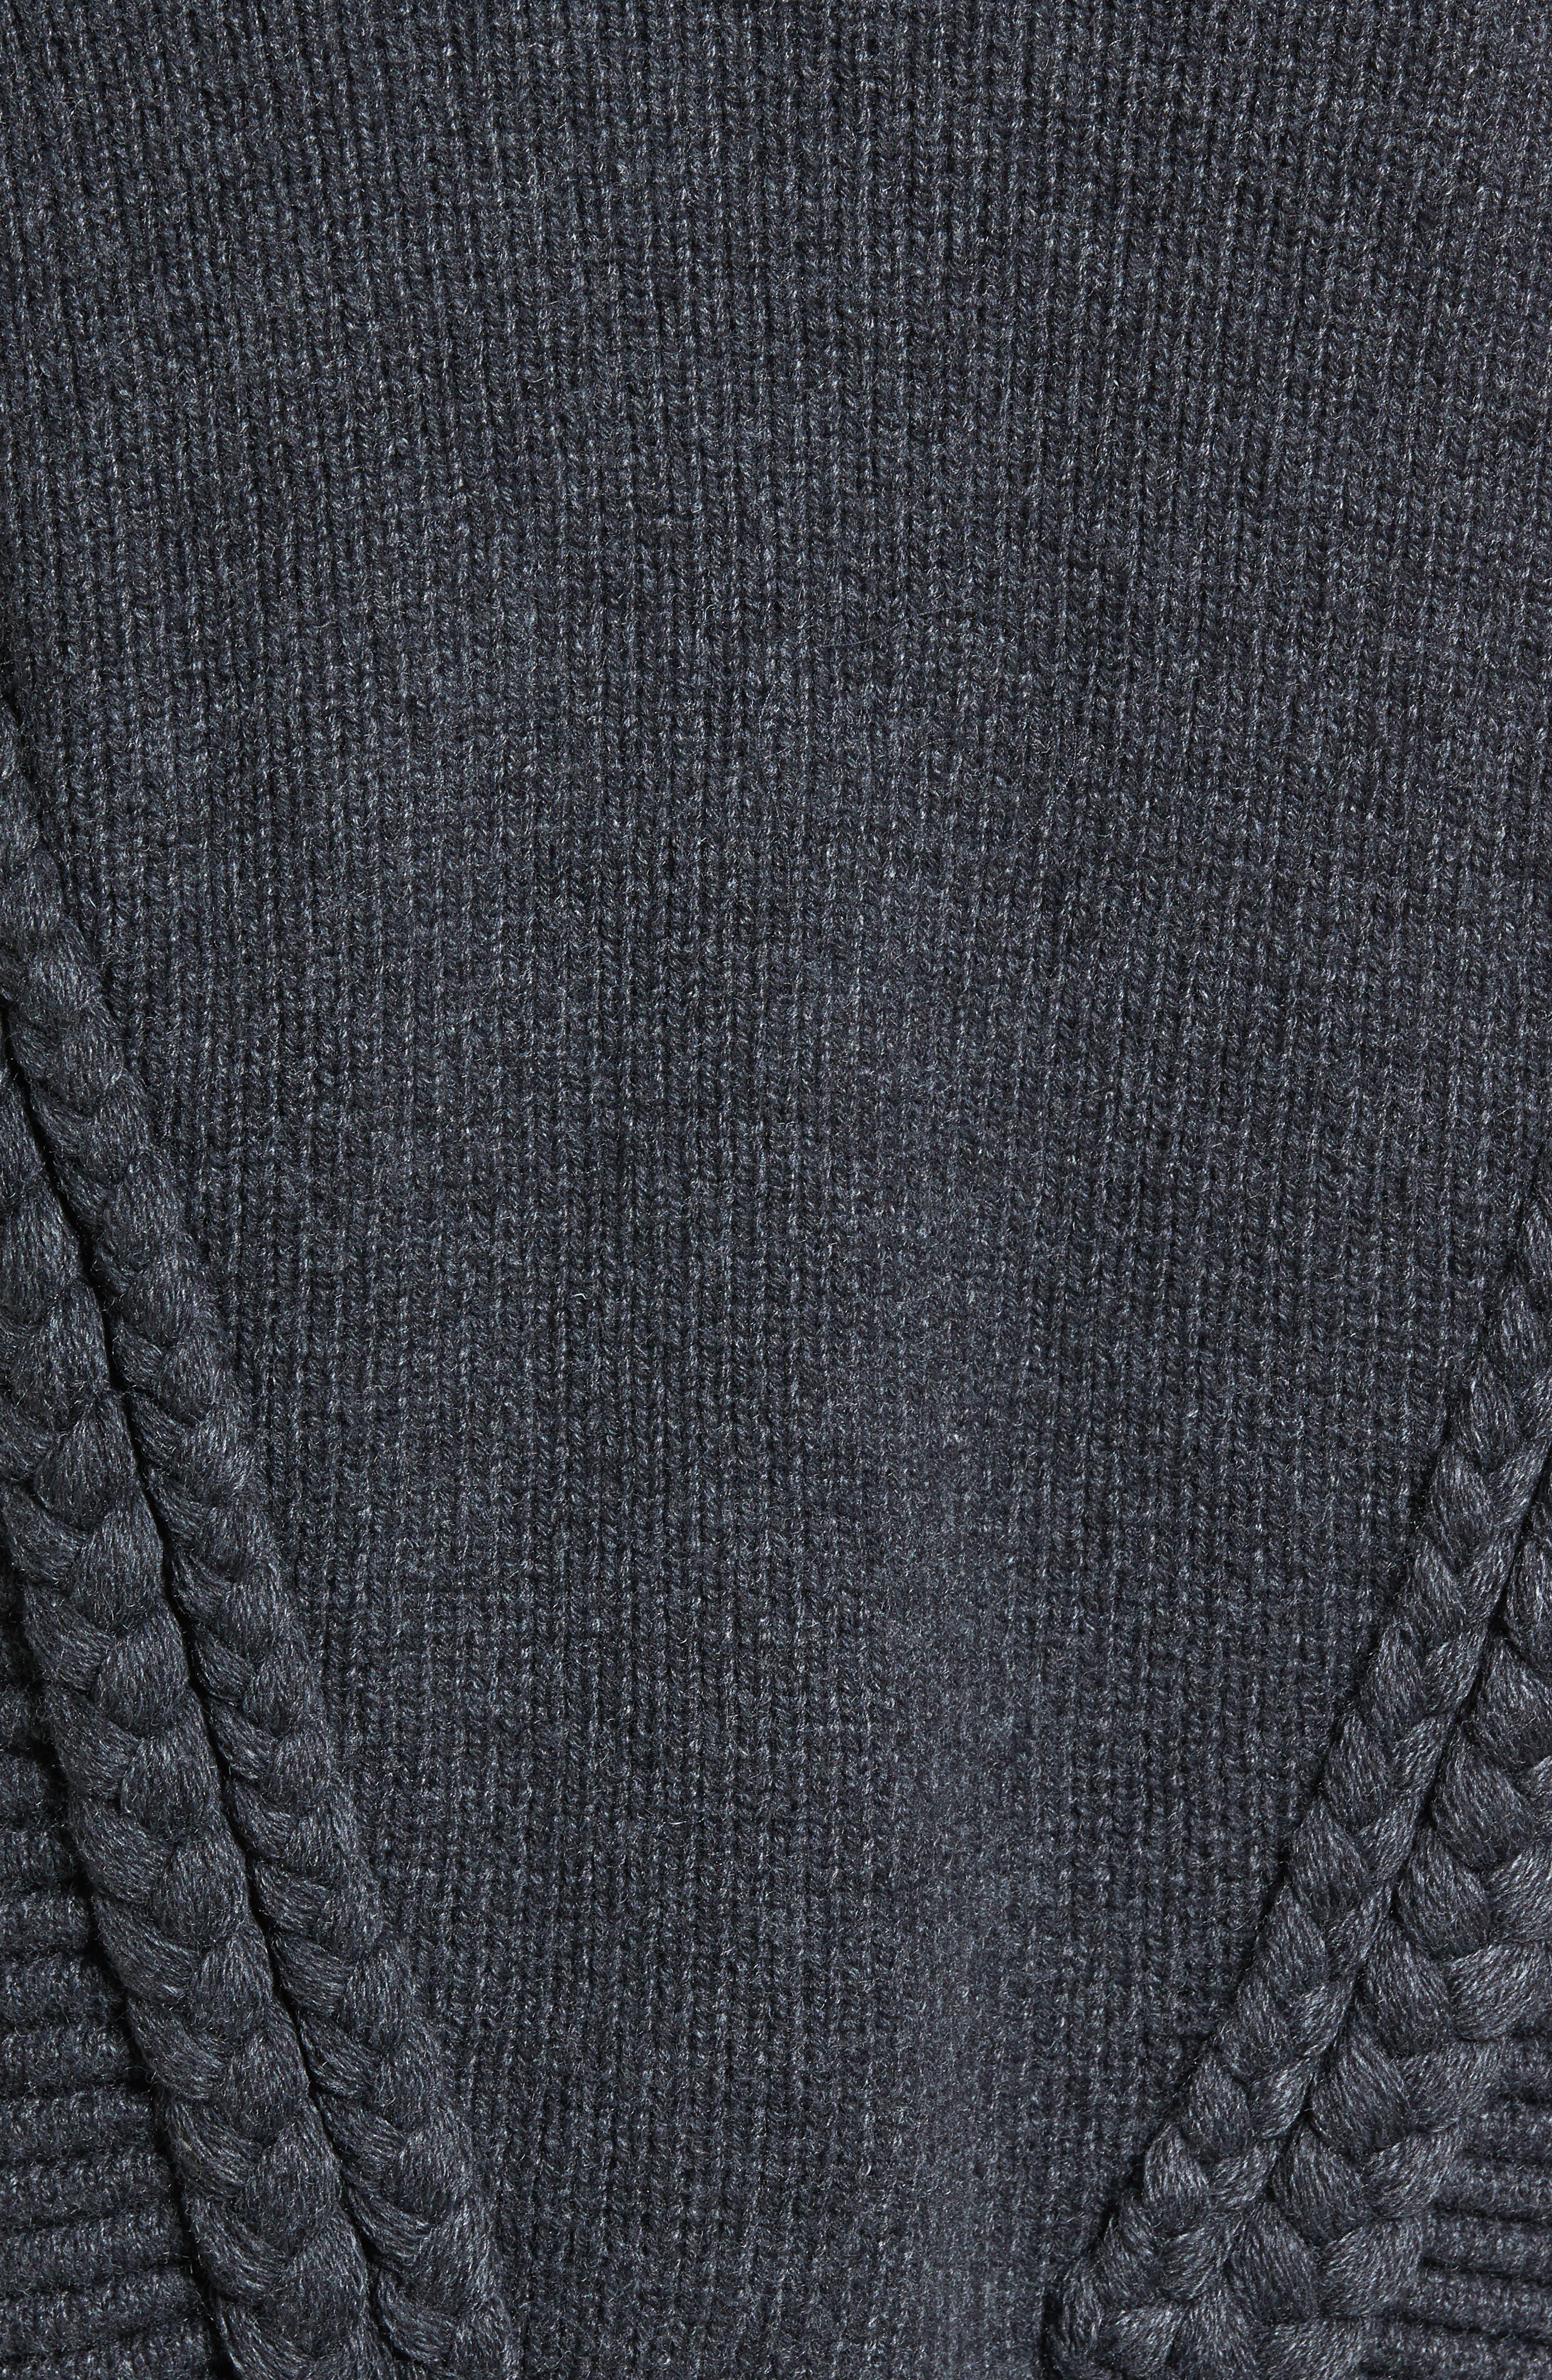 Cable Detail Cardigan,                             Alternate thumbnail 5, color,                             020